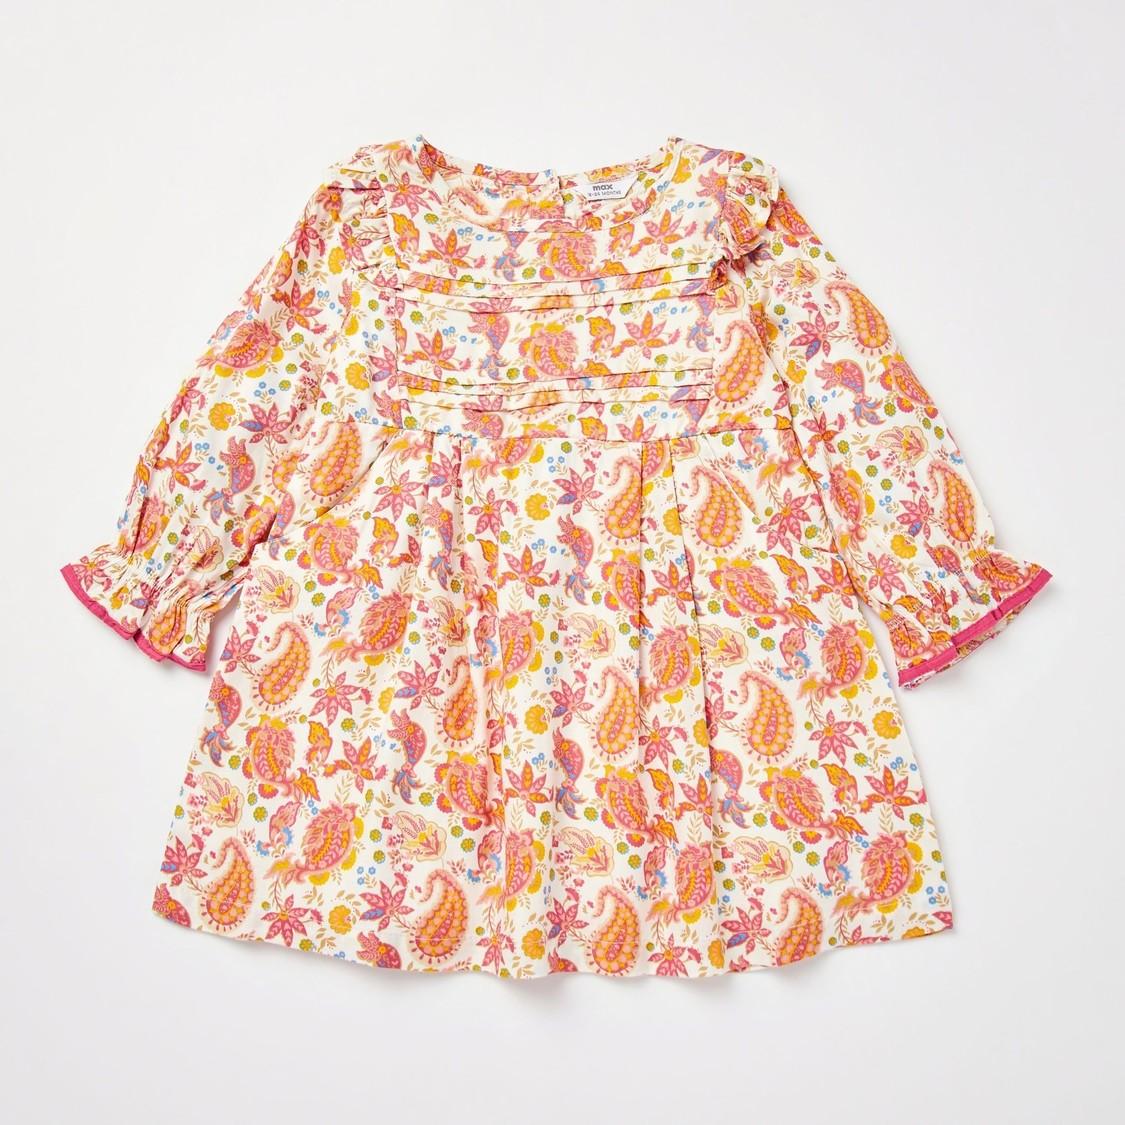 Paisley Print Long Sleeves Dress with Plush Gilet Jacket